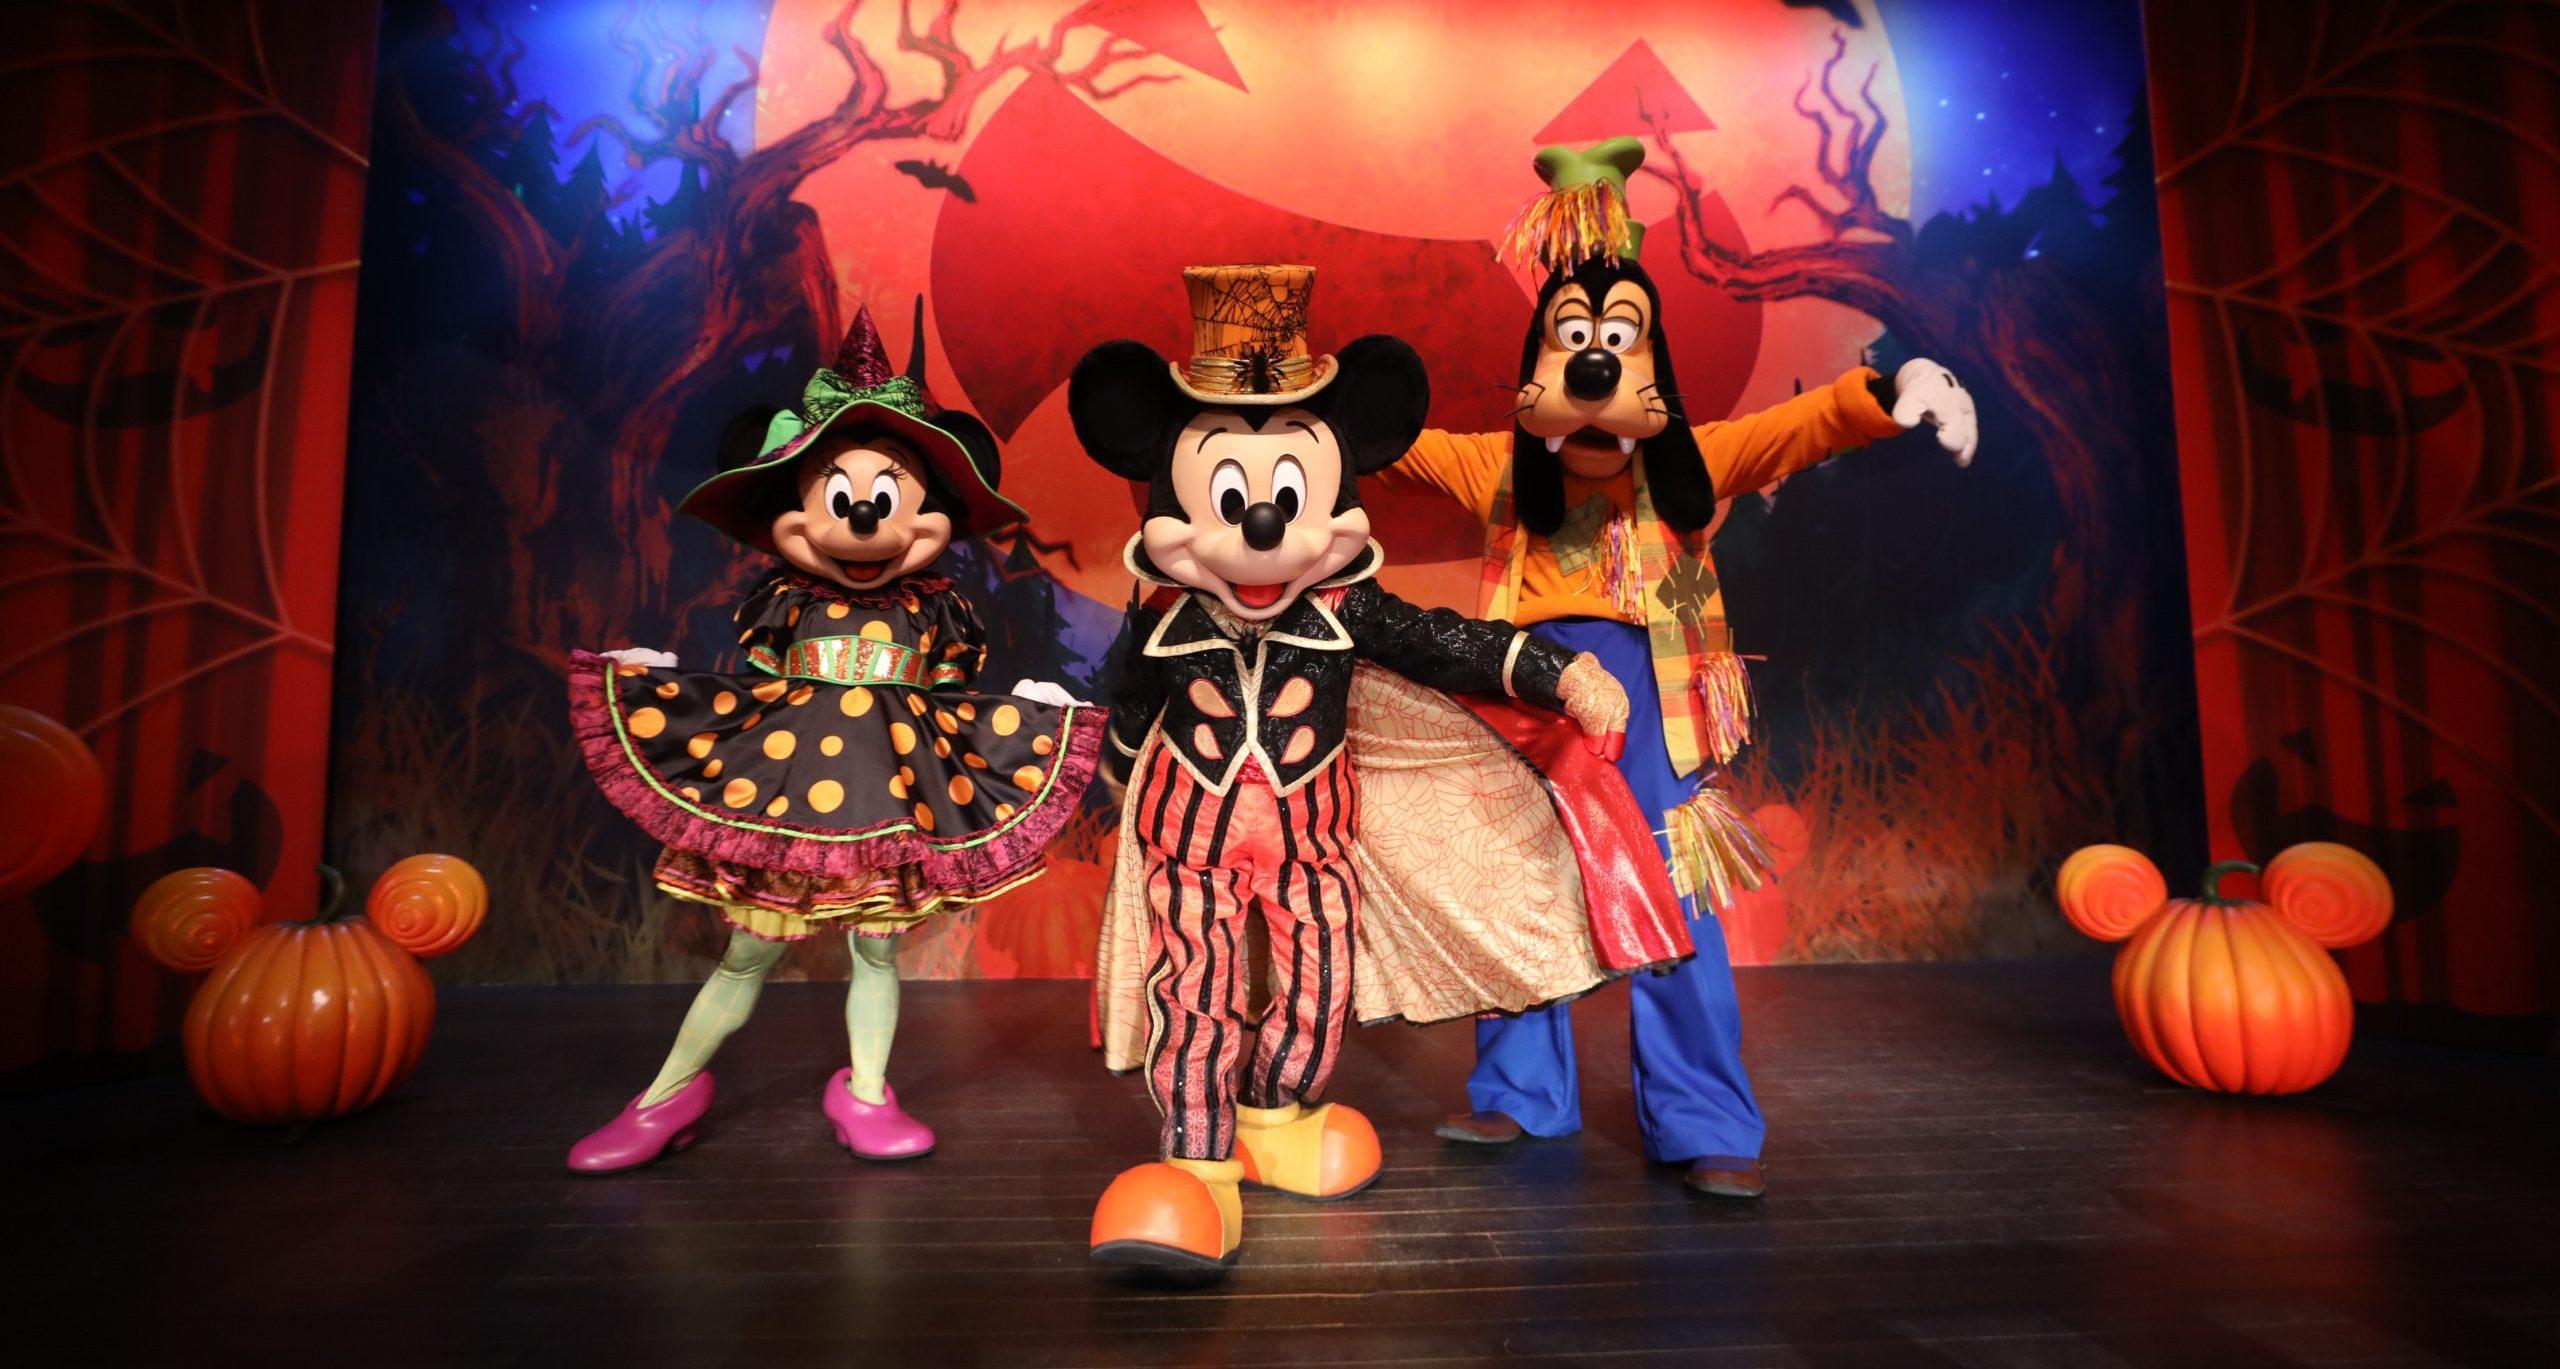 Minnie, Mickey et Dingo dans un Point Selfie spécial Halloween à Disneyland Paris